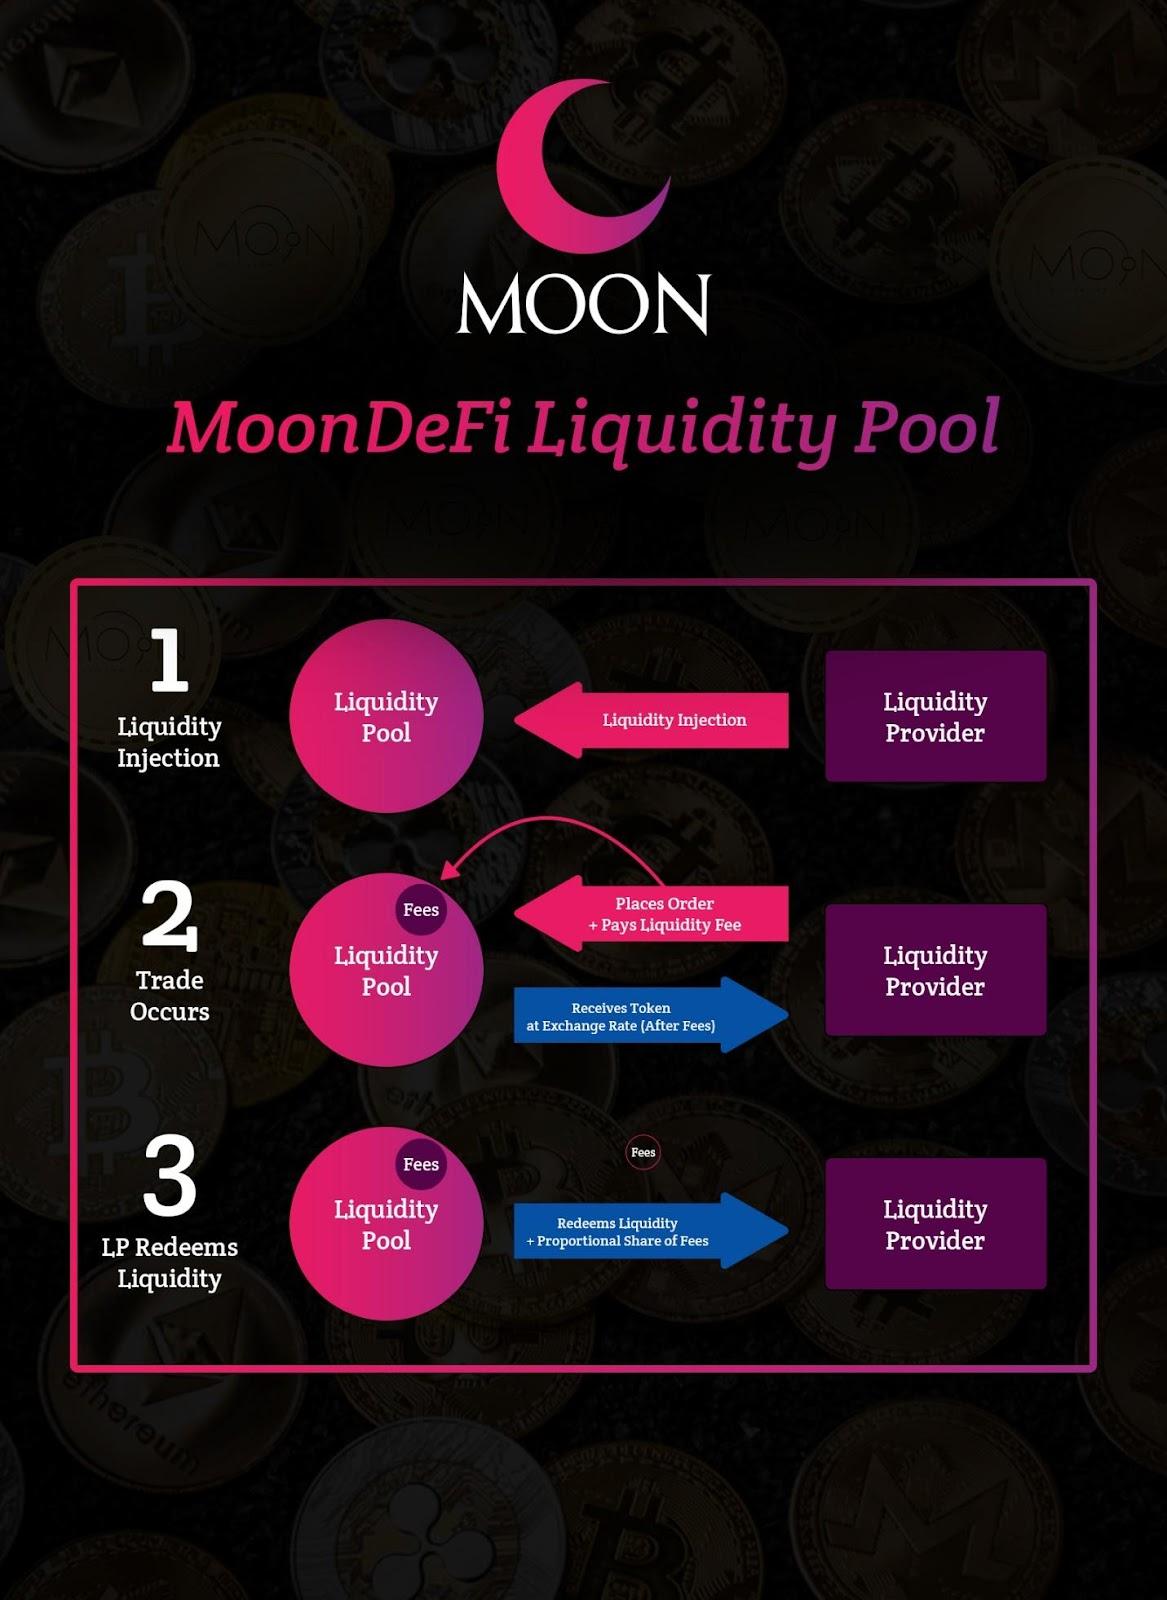 D:\kaka\MOON\design\Liquidity (2).jpg